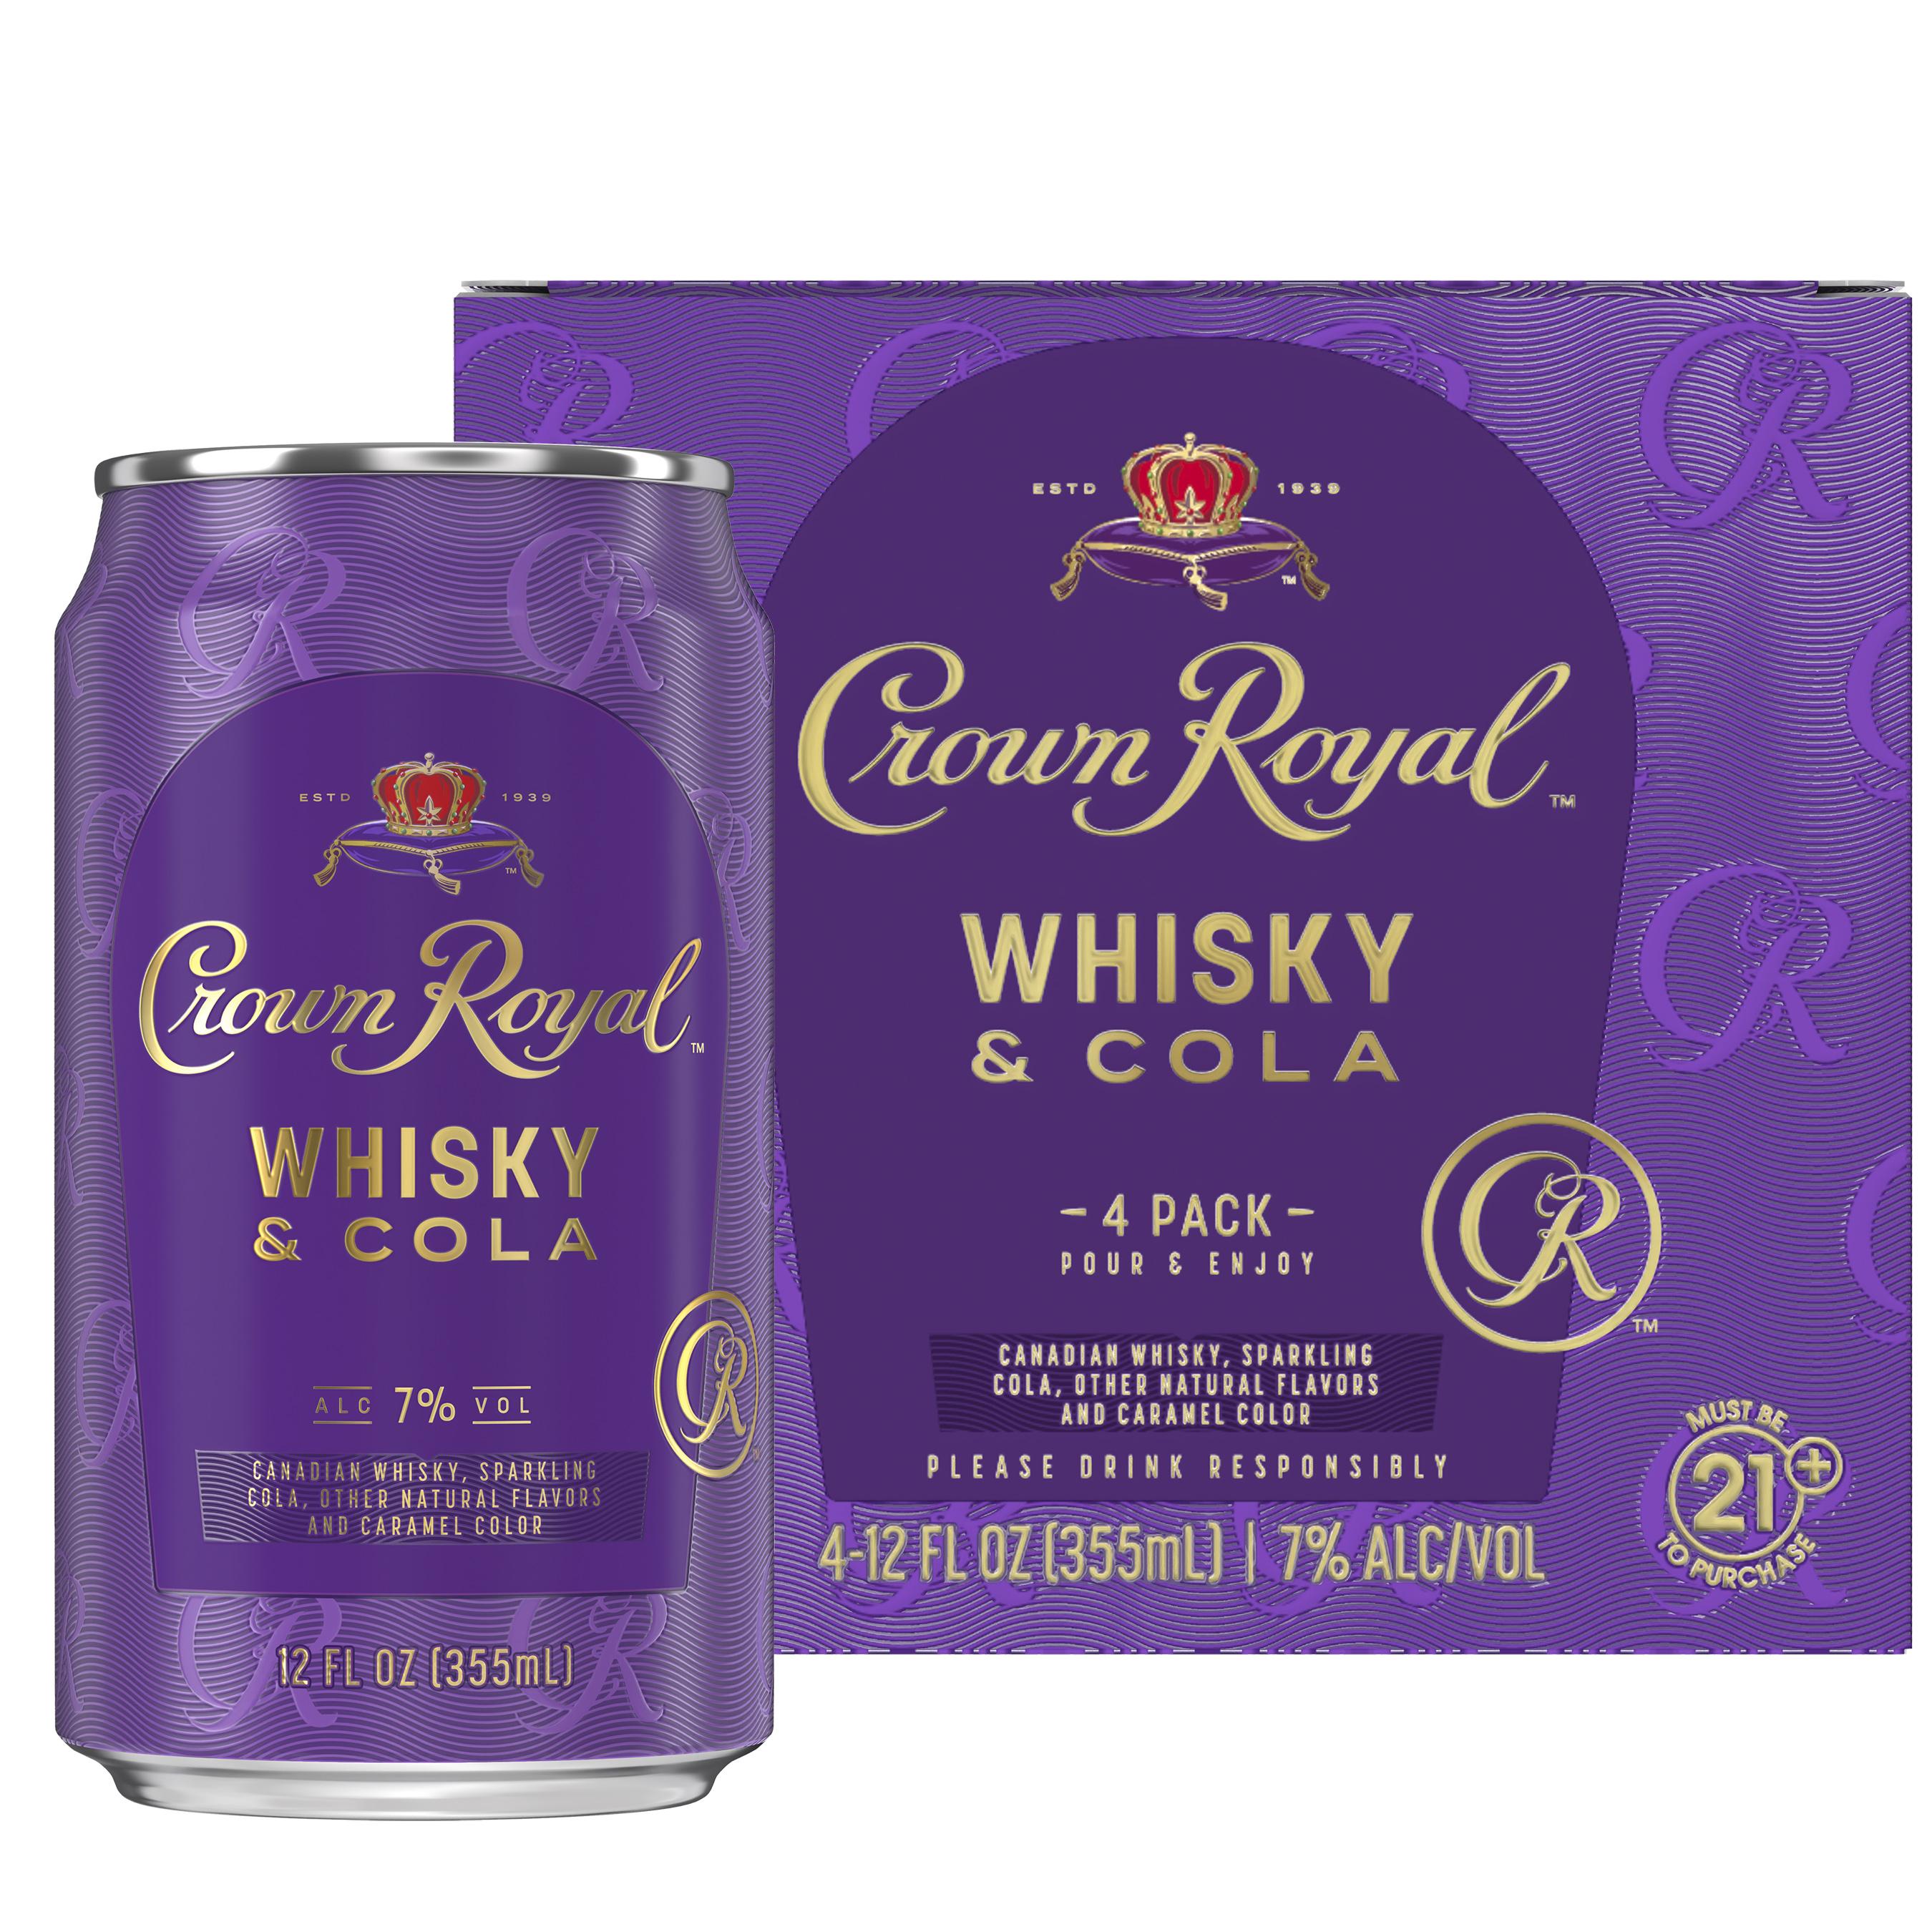 Crown Royal Whisky & Cola 4 pack